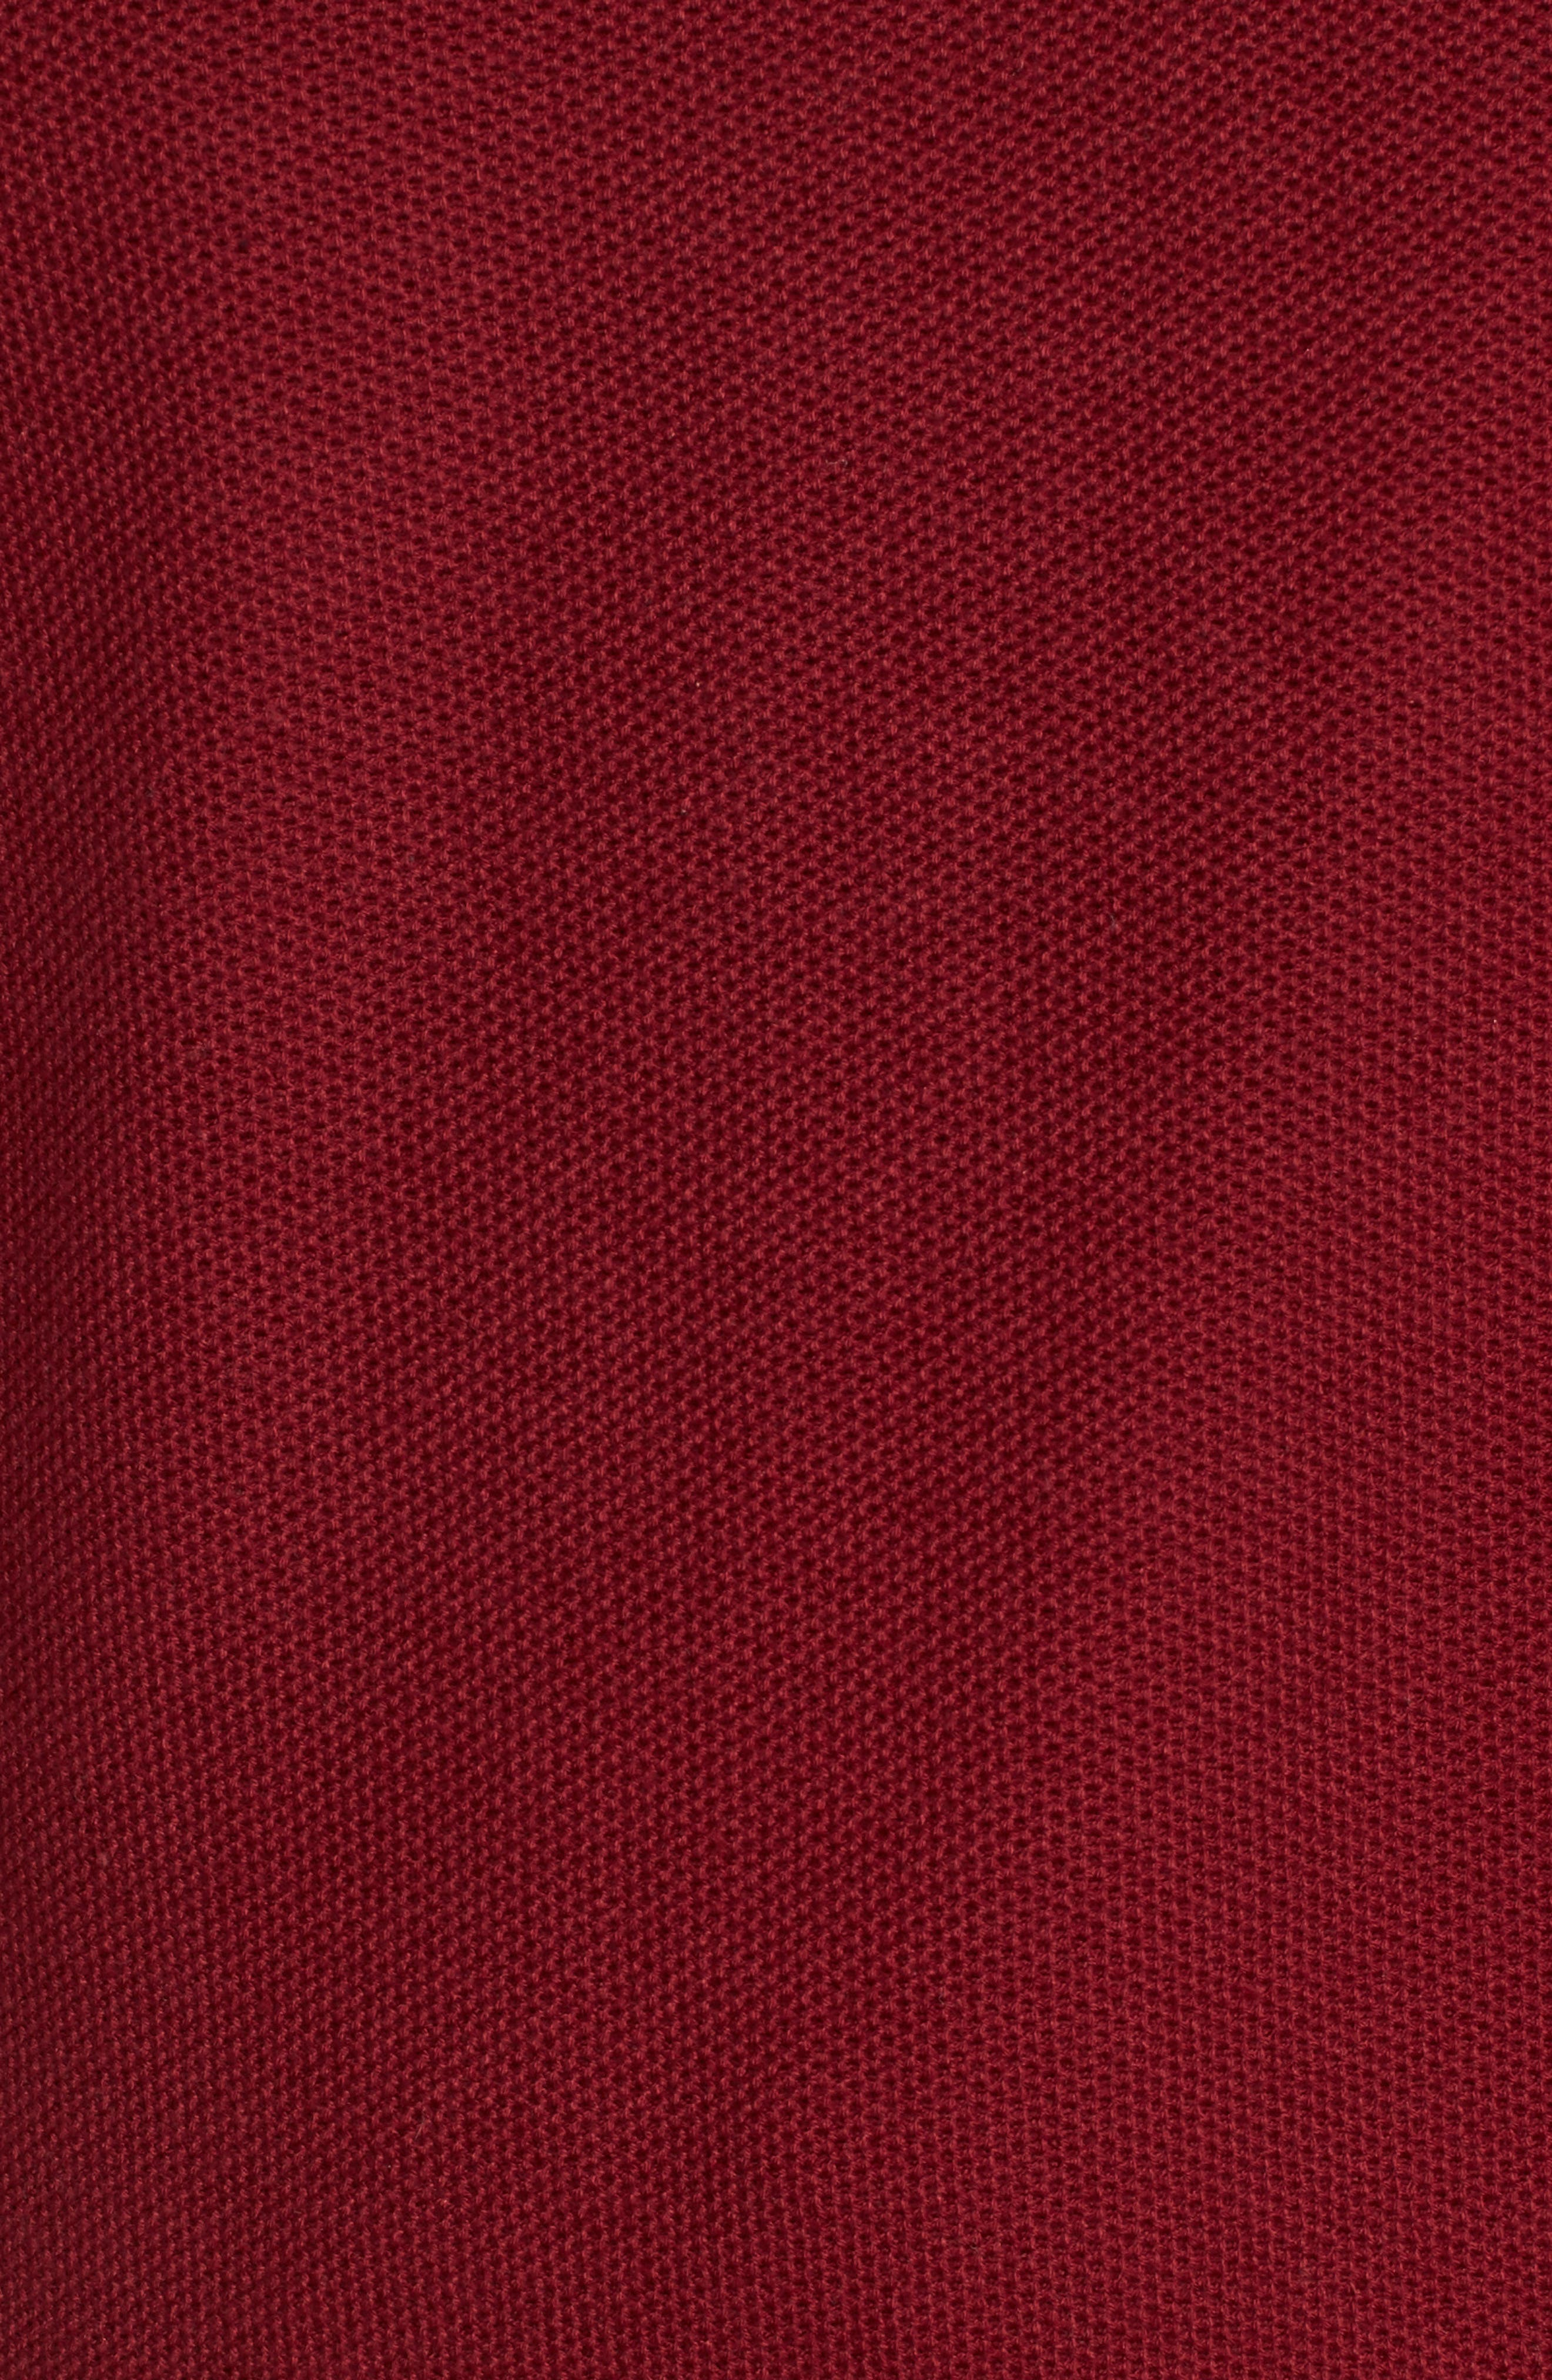 Alternate Image 5  - TailorByrd Prien Tipped Quarter Zip Sweater